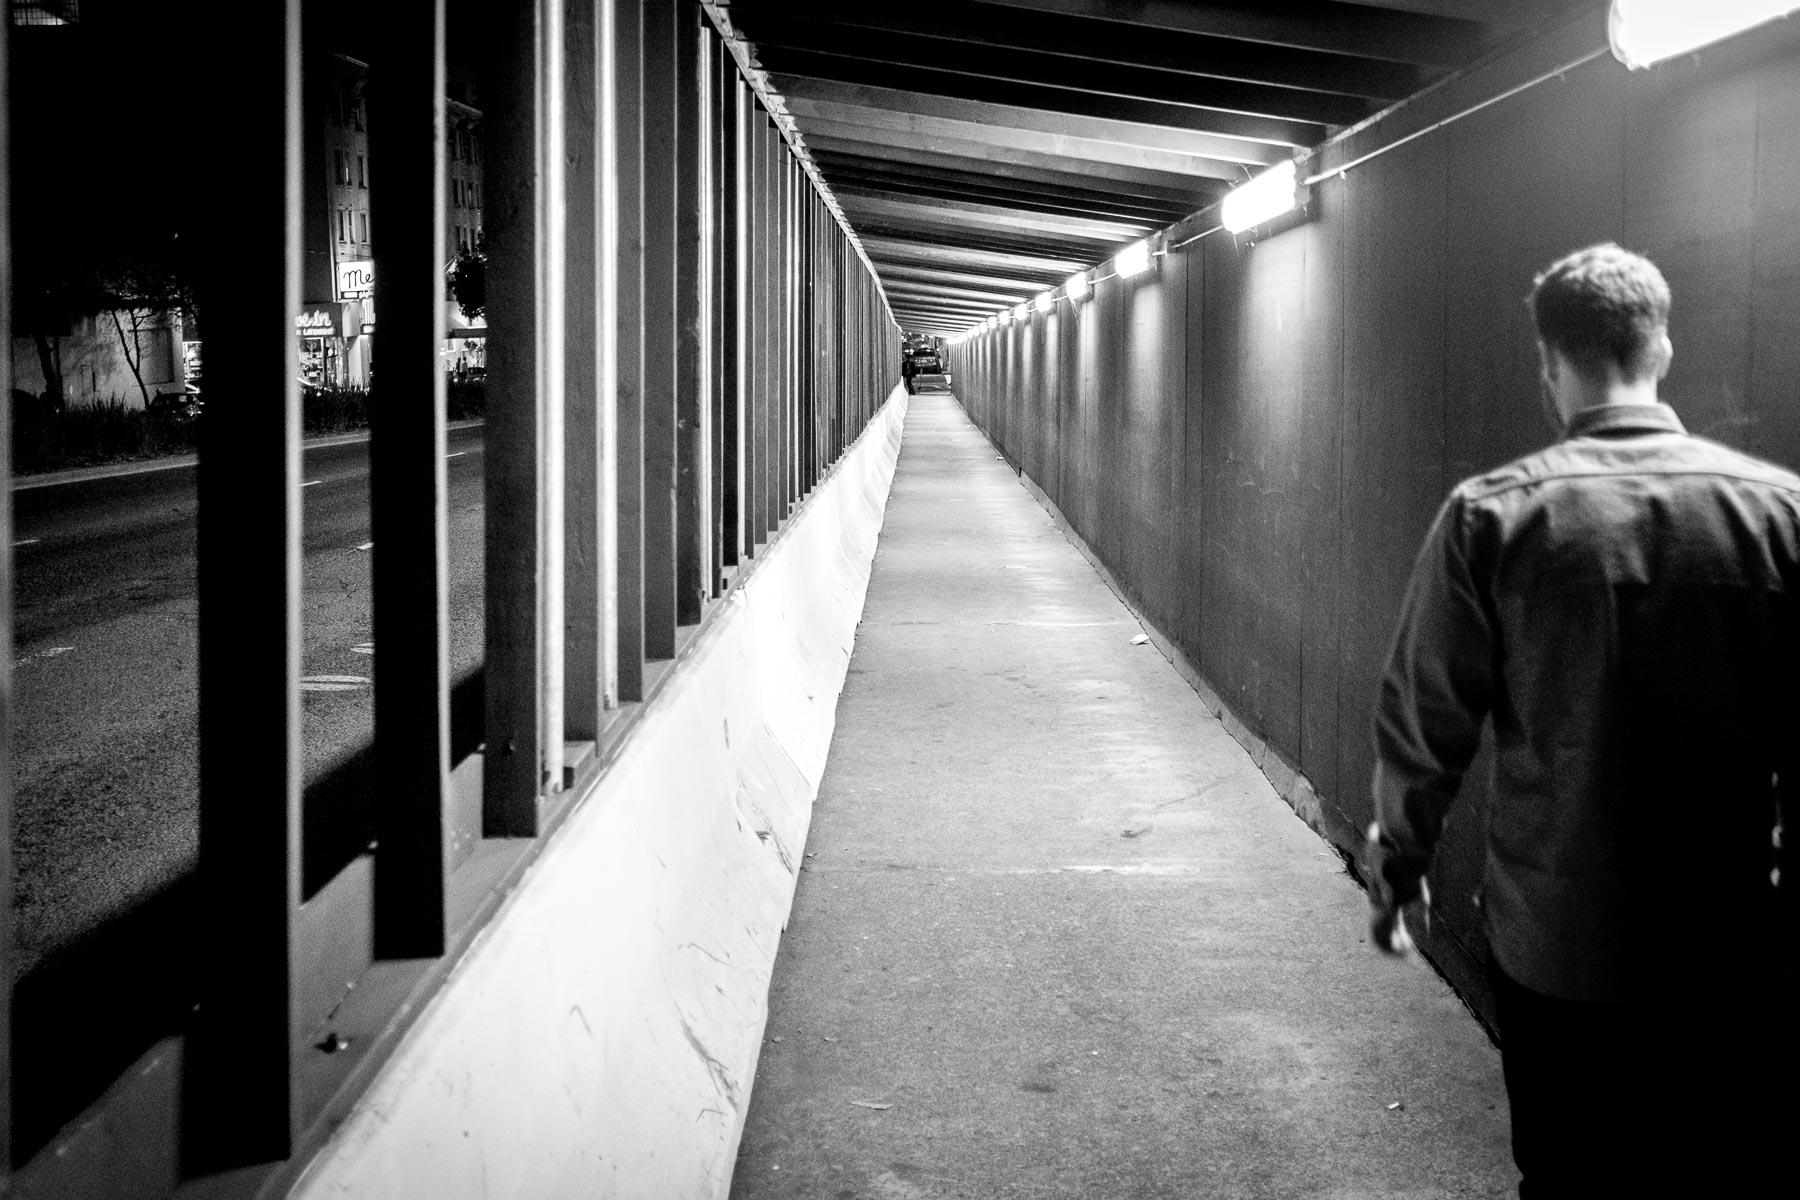 Justin Walkway